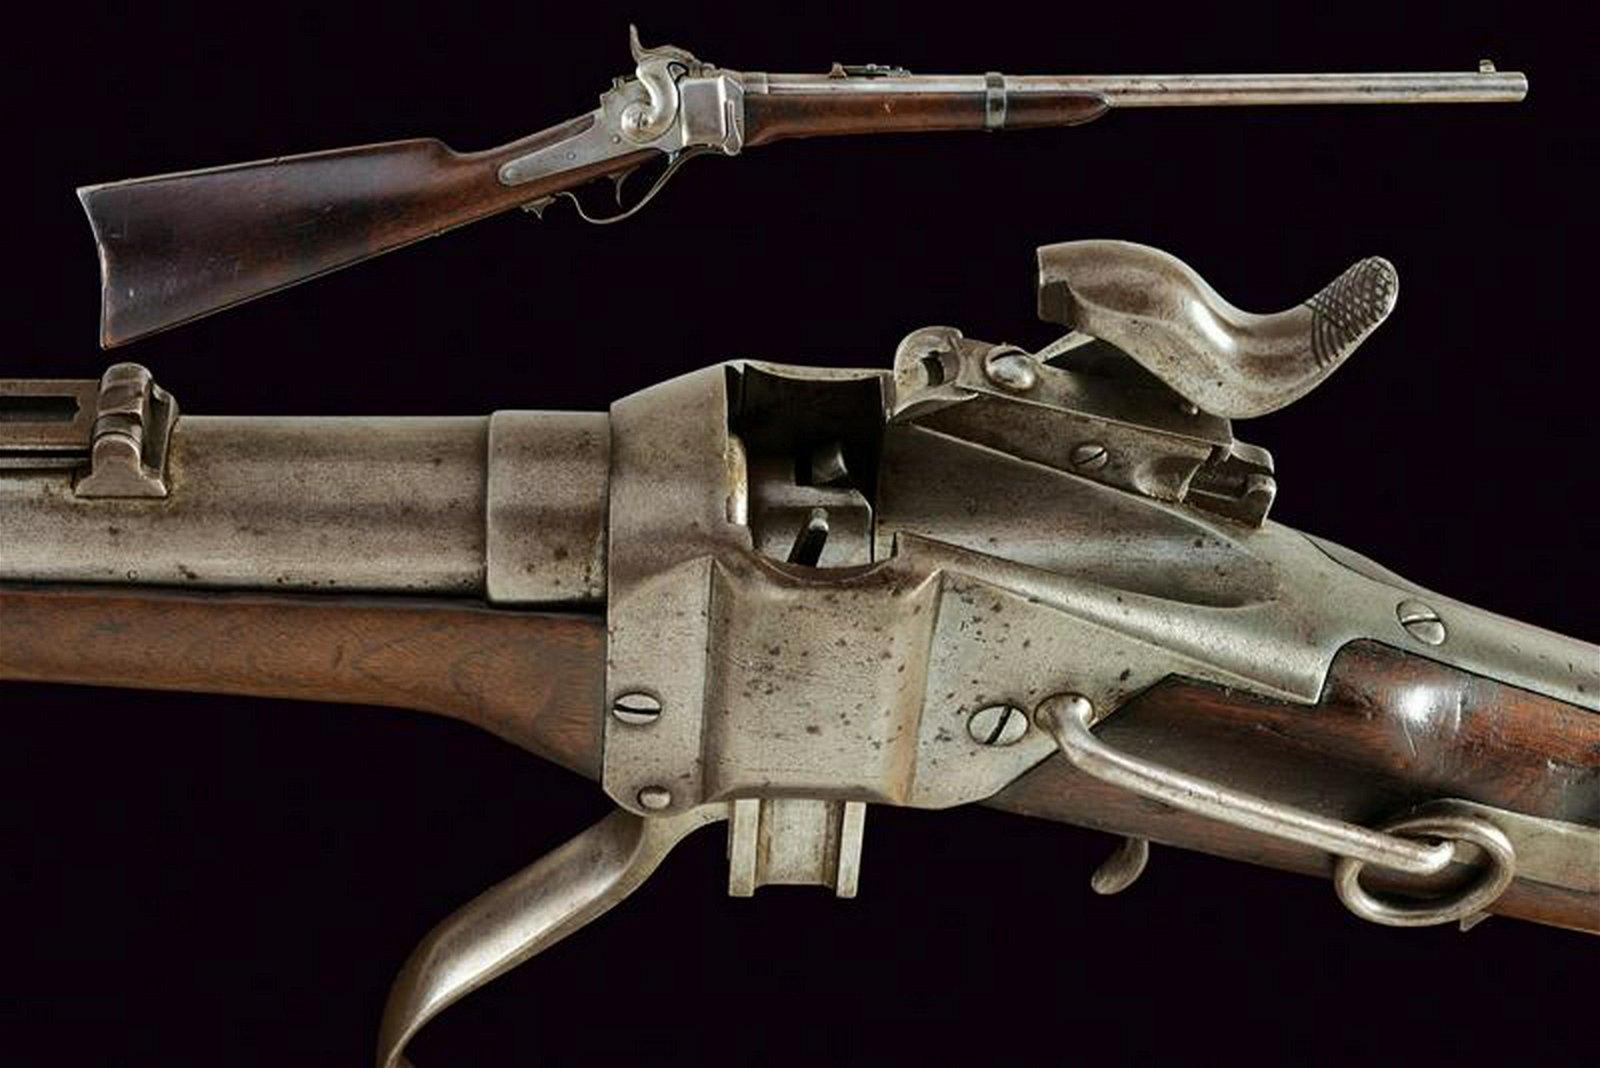 A Sharps New Model 1859 Carbine, metallic cartridge